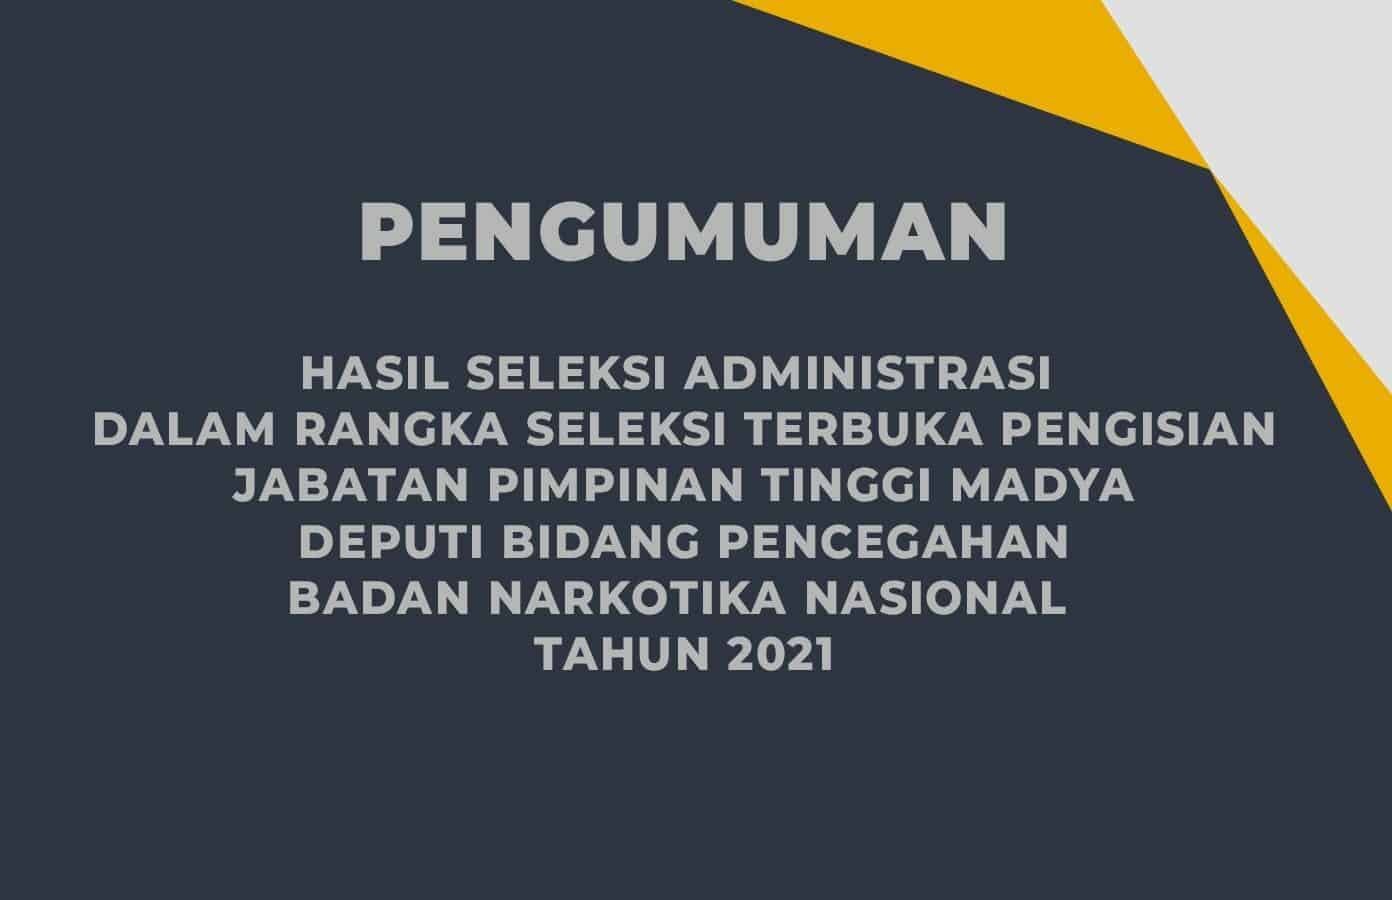 Pengumuman Hasil Seleksi Administrasi Pengisian Jabatan Pimpinan Tinggi Madya Deputi Bidang Pencegahan BNN RI